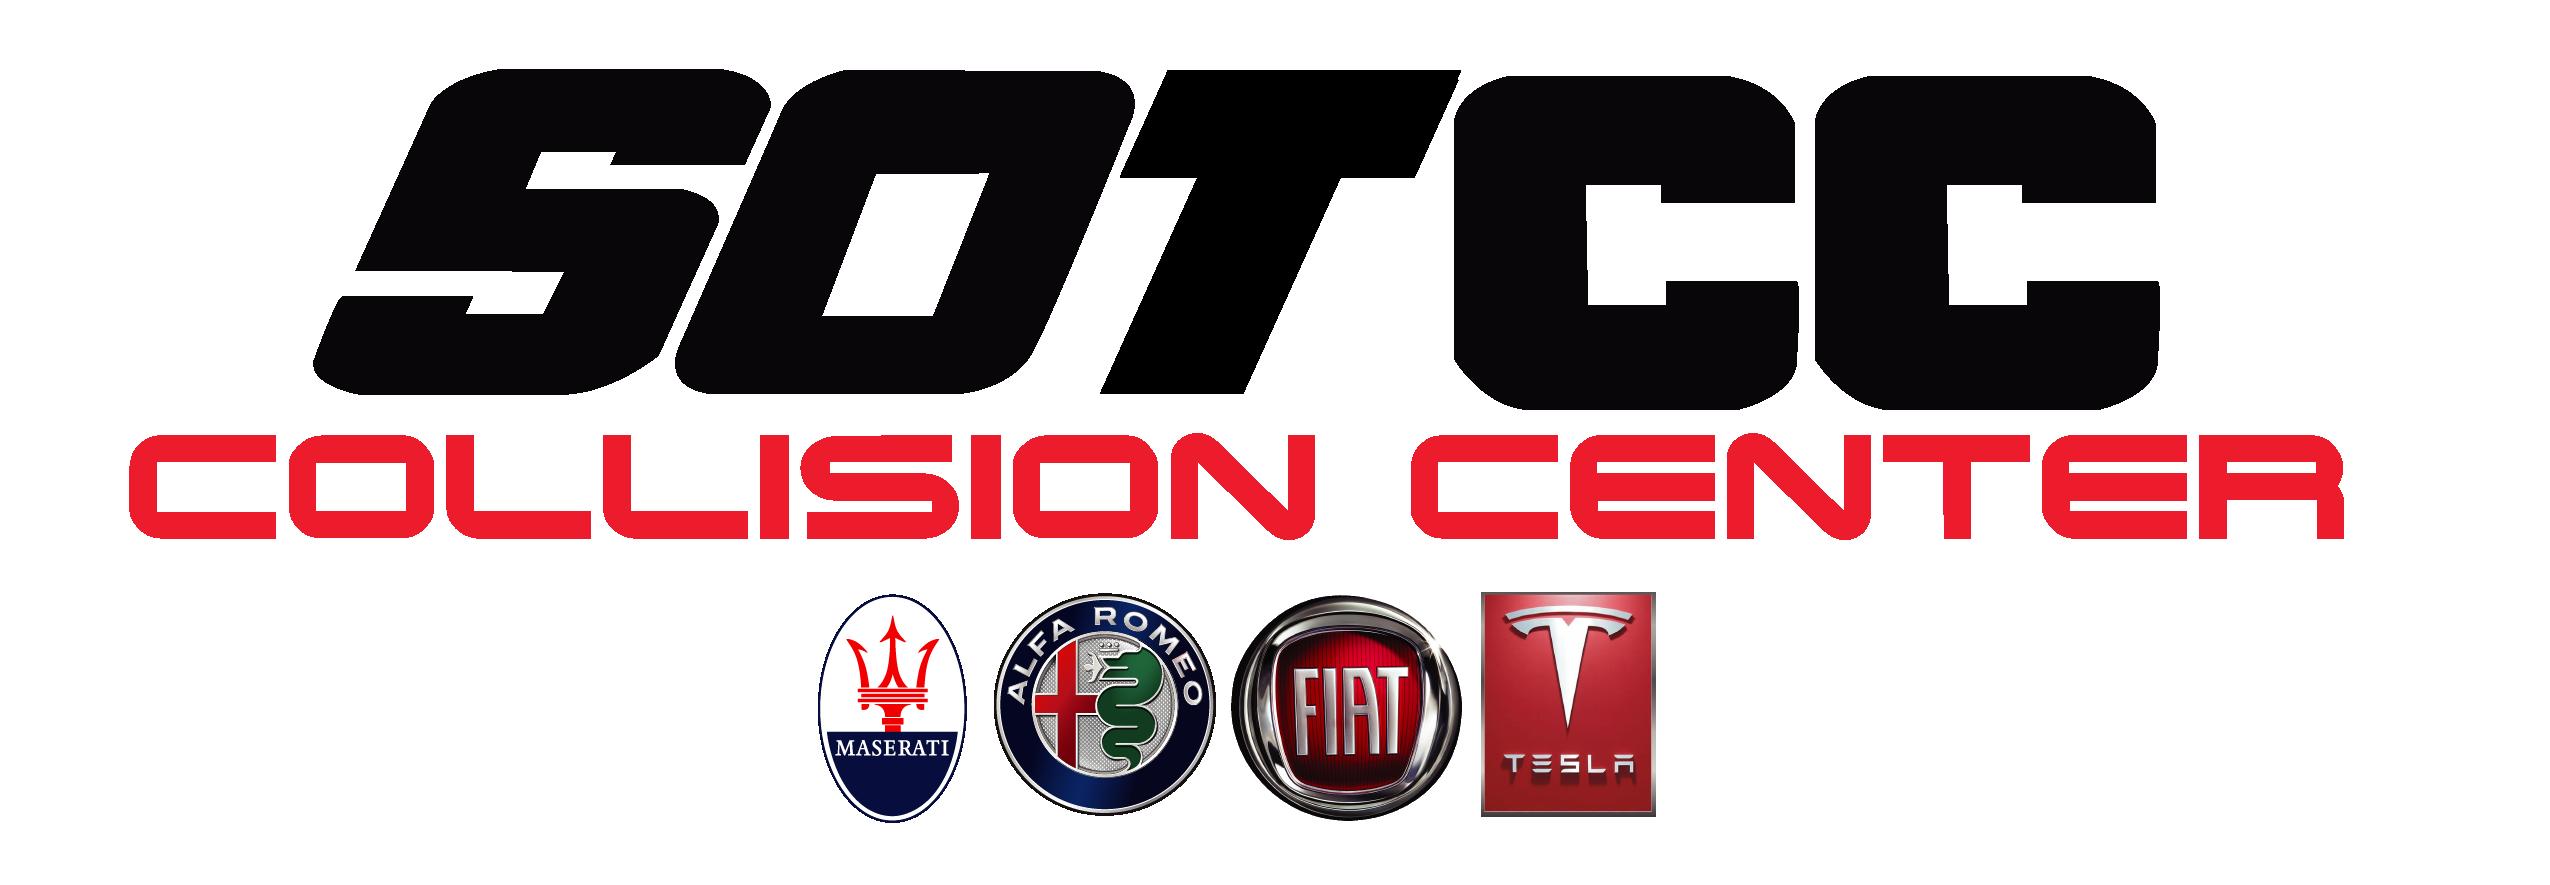 Safford Tysons Collision Center Logo